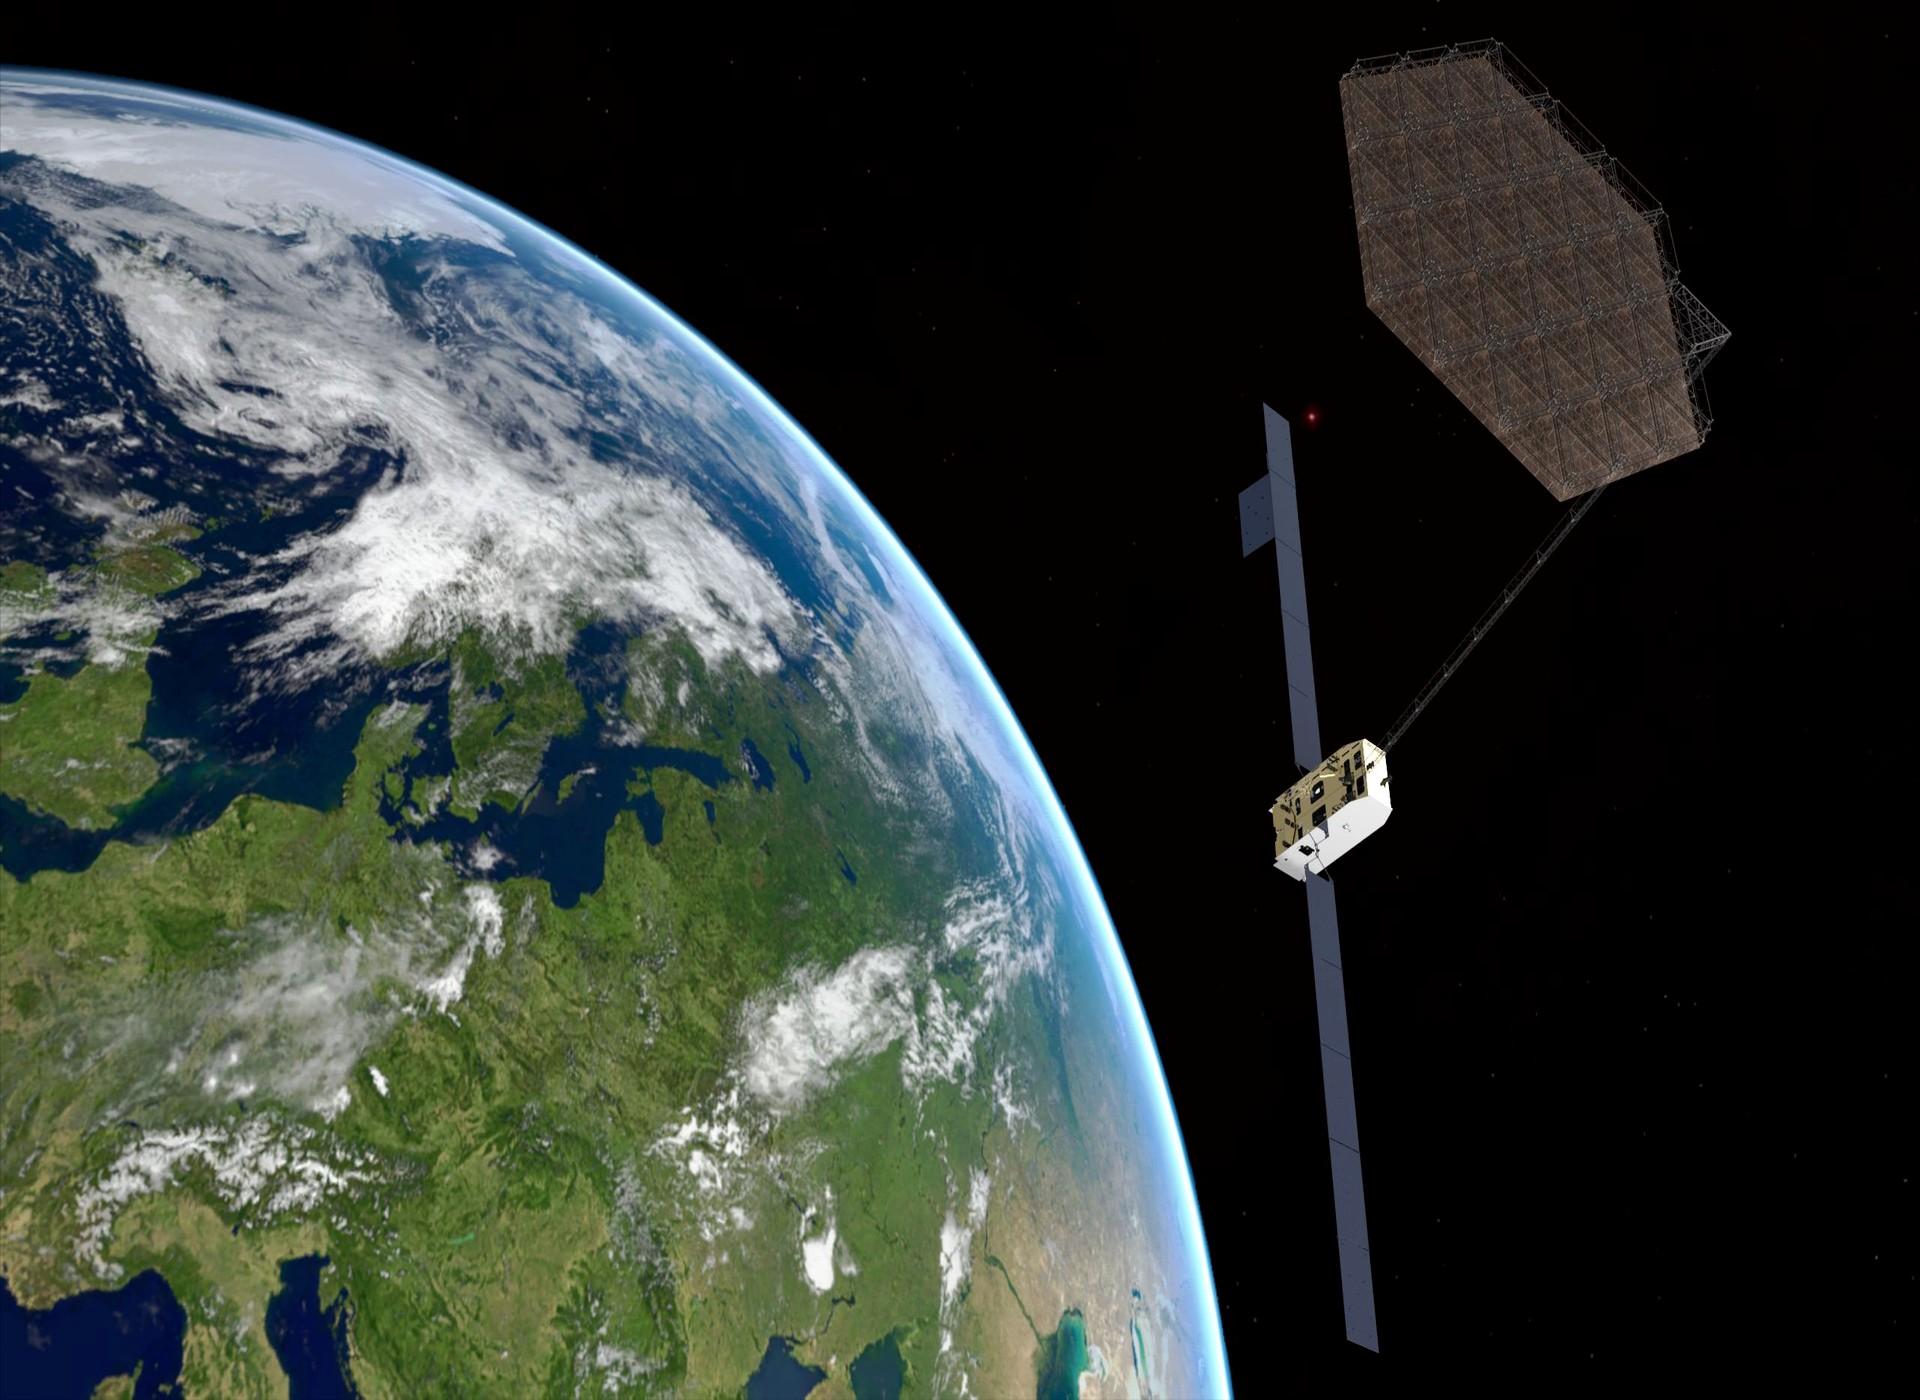 Airbus  - Airbus 7 - EC selects Airbus to explore spacecraft manufacturing in space